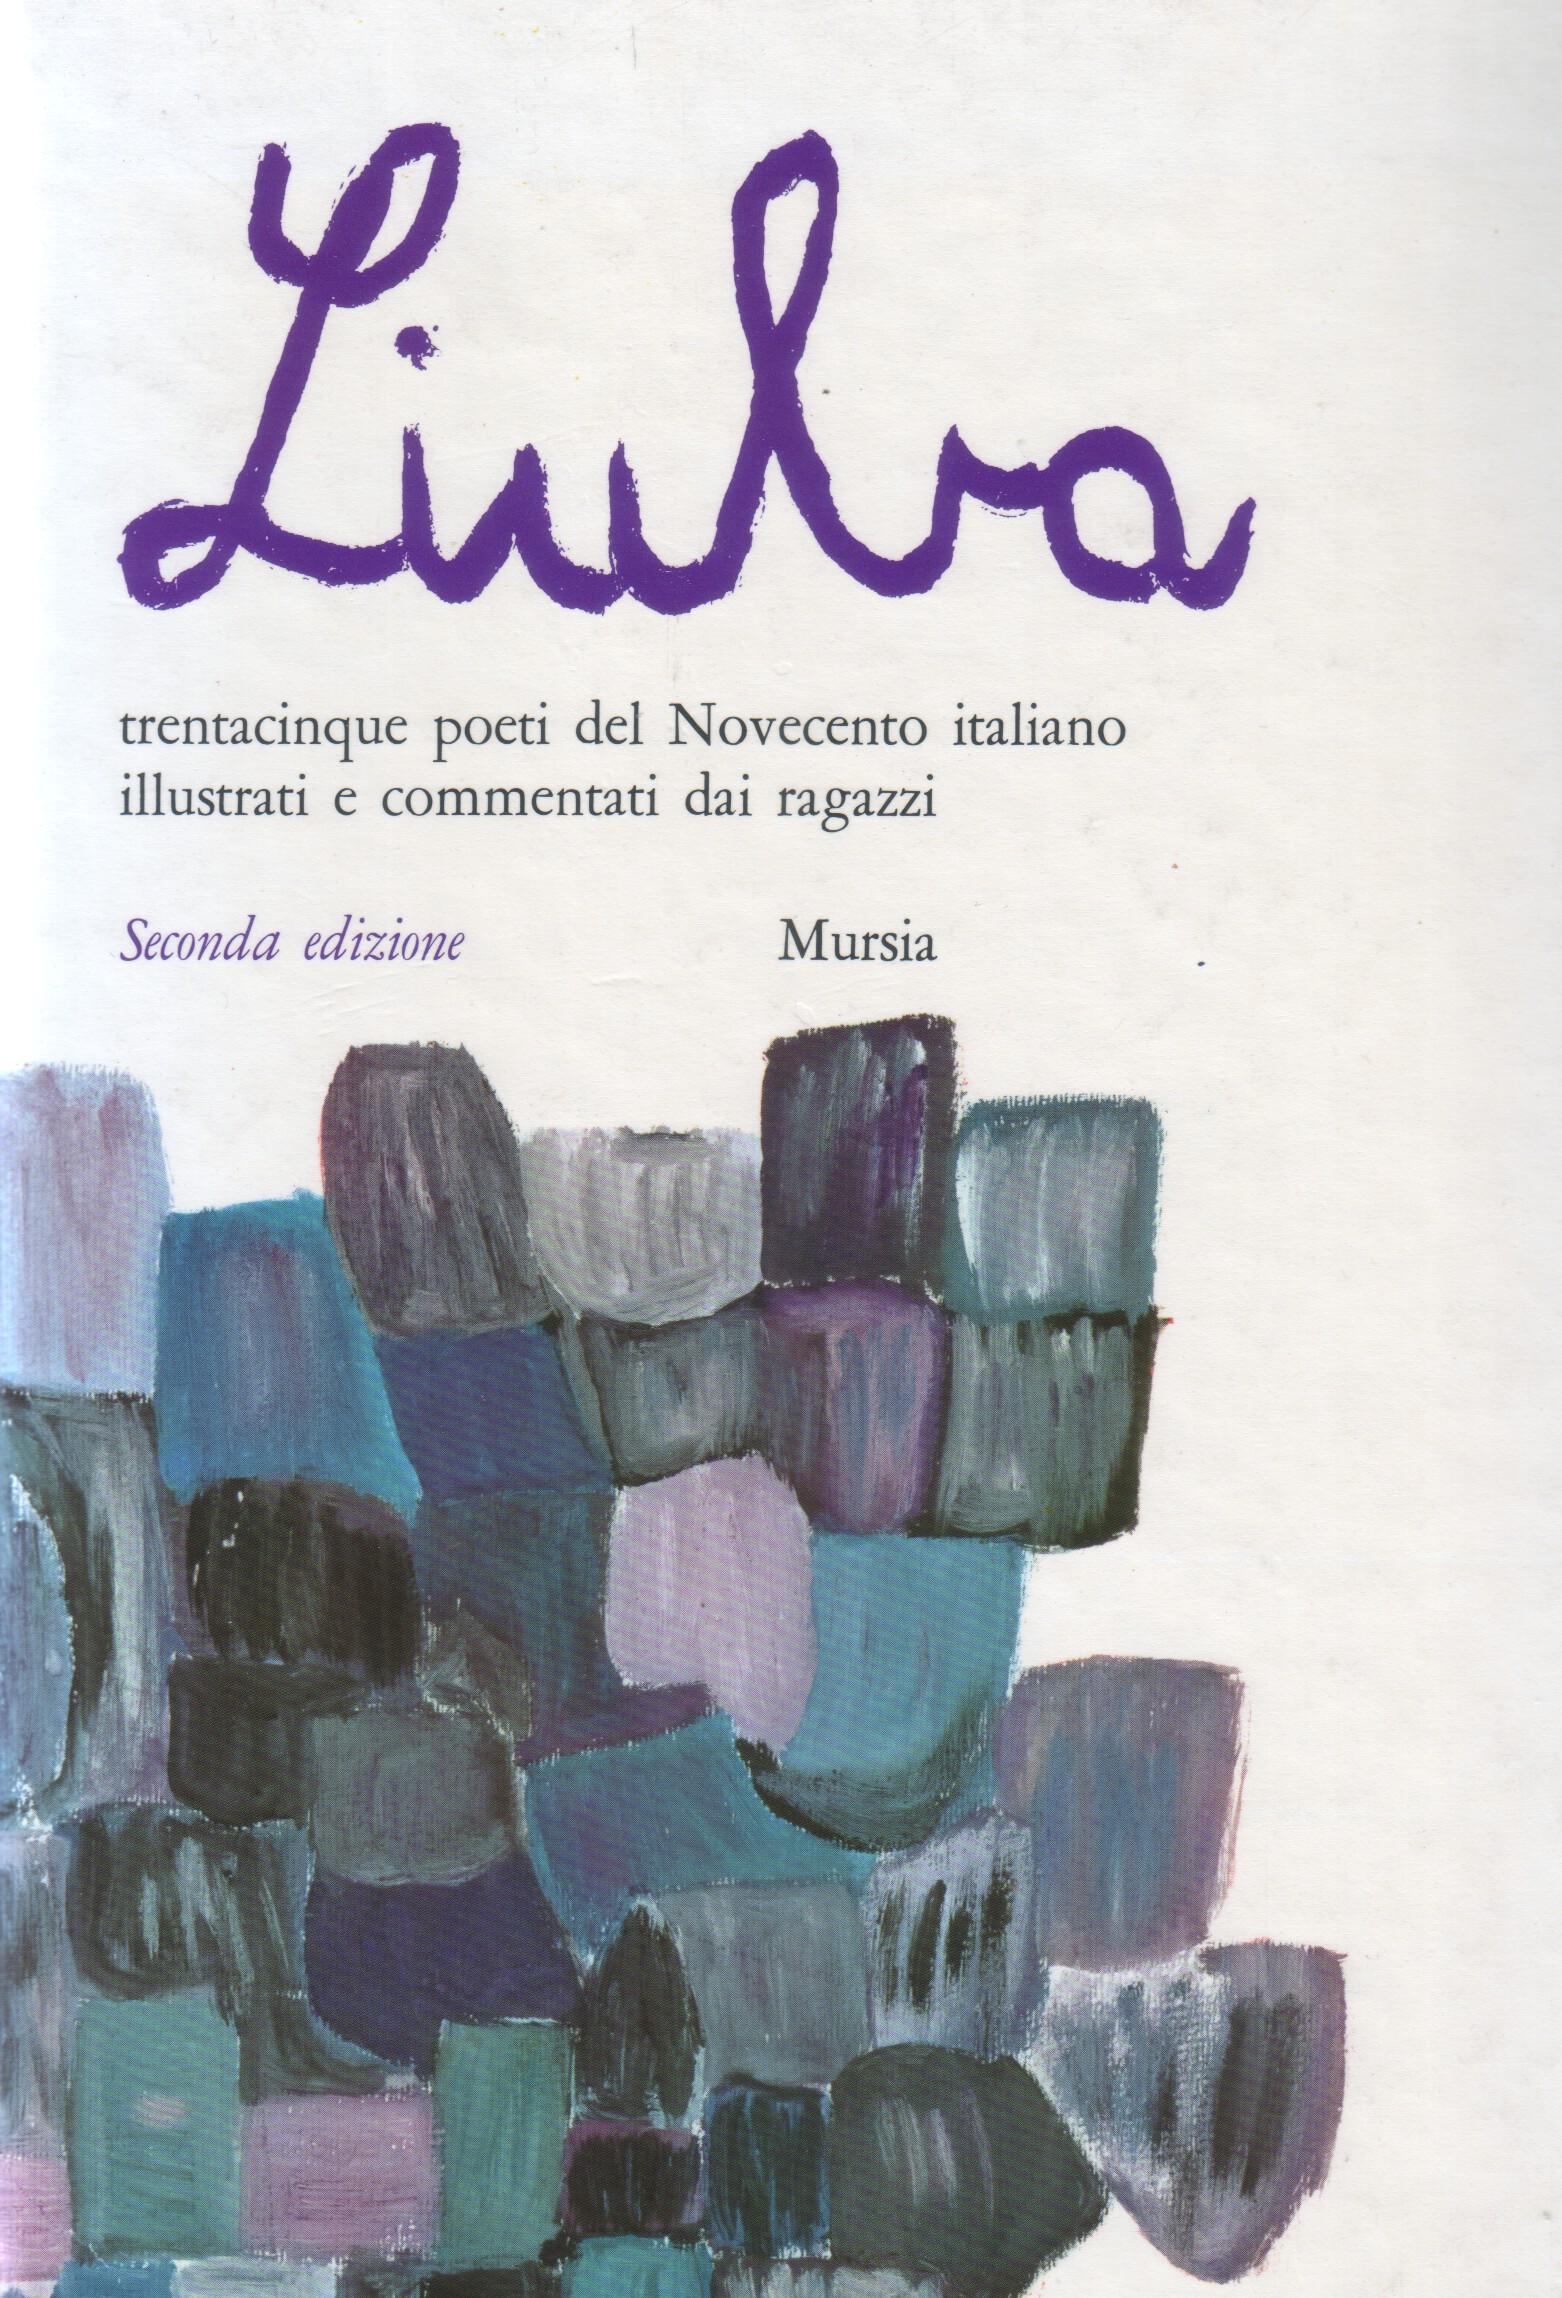 Liuba copertina Marino Ghirardelli Mursia